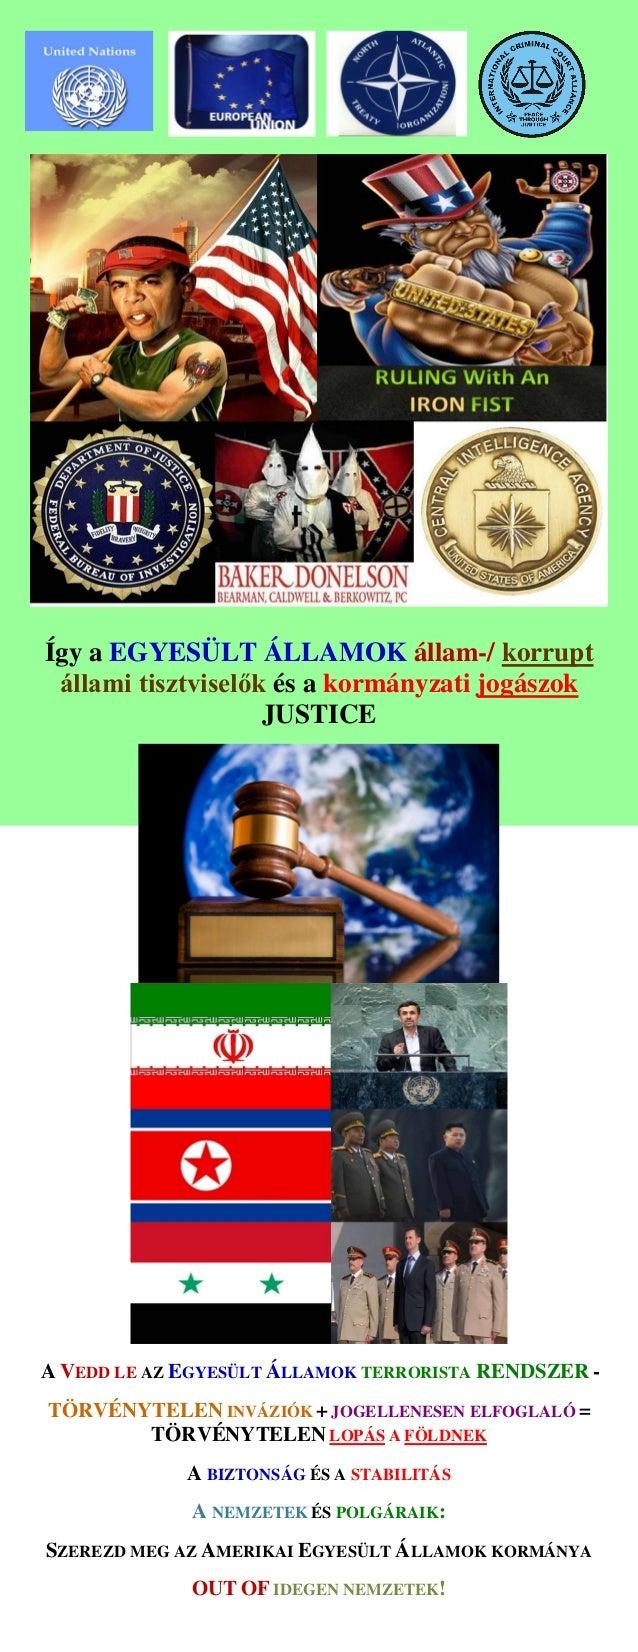 04/14/13  PUBLIC NOTICE (03/11/13 FAX TO BARACK OBAMA) - hungarian